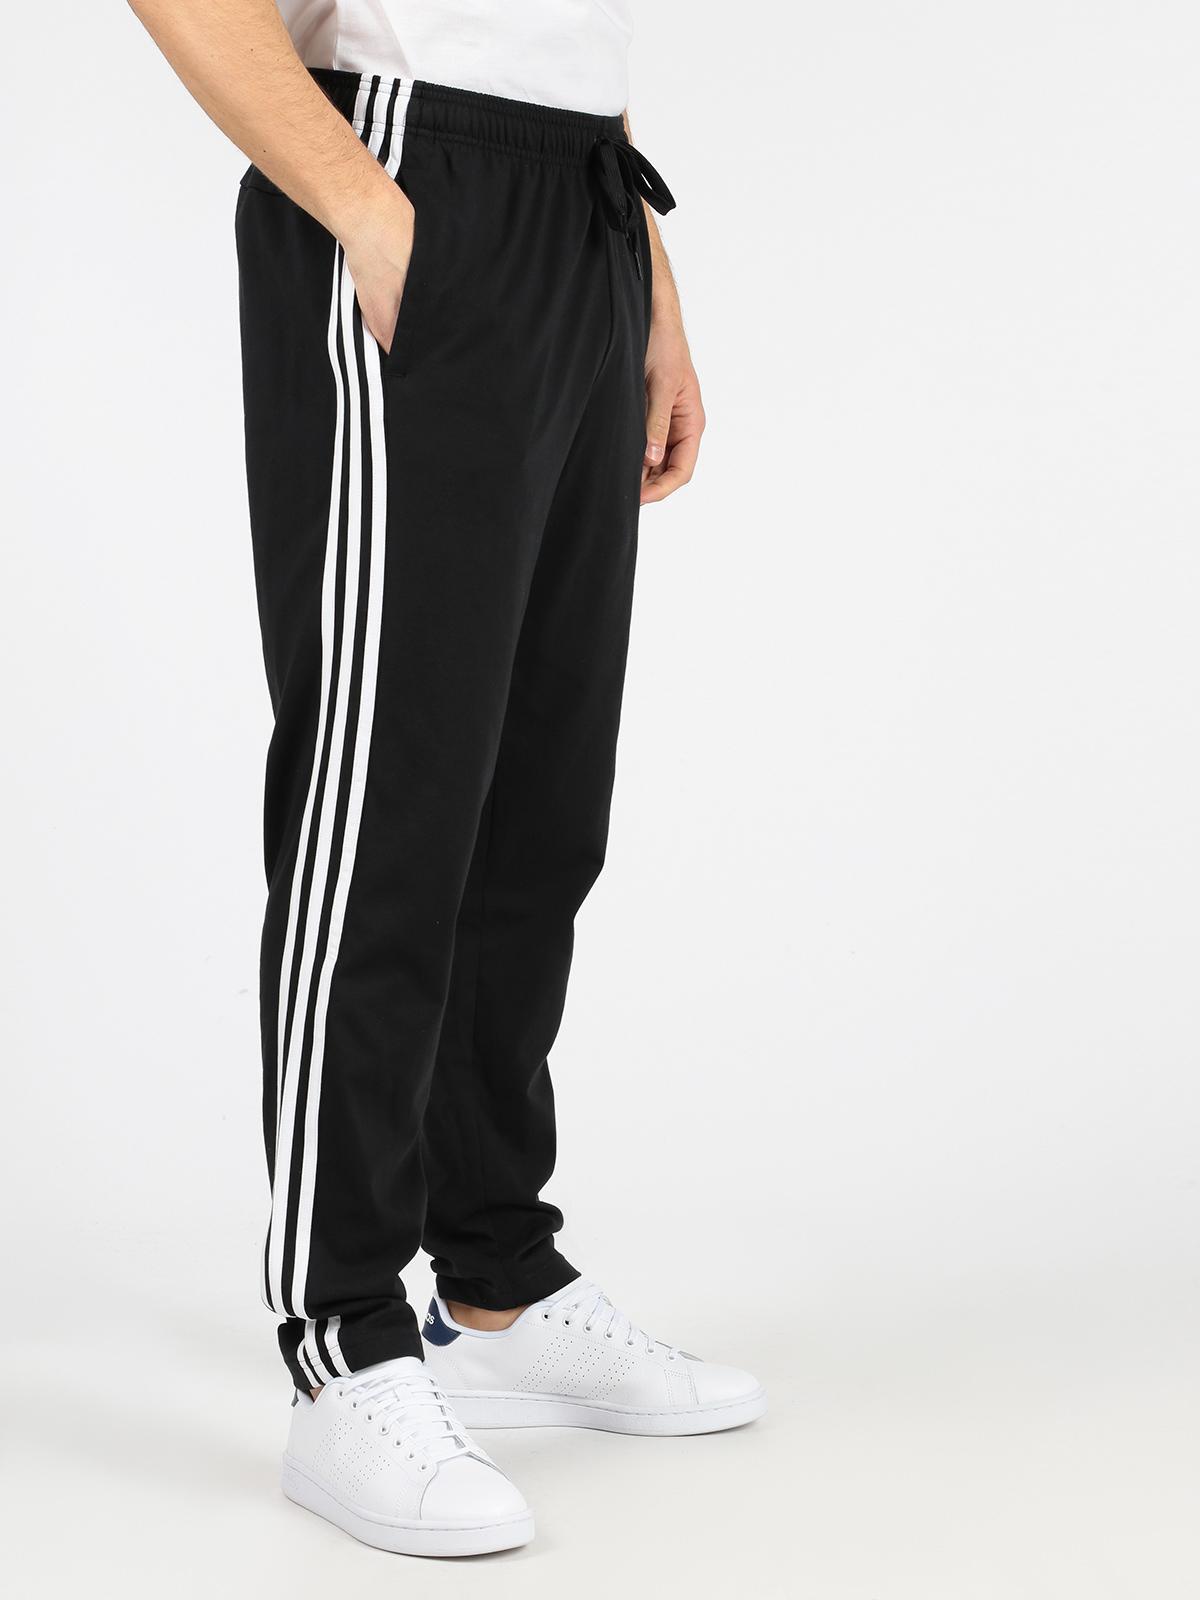 pantaloni adidas essentials 3 stripes